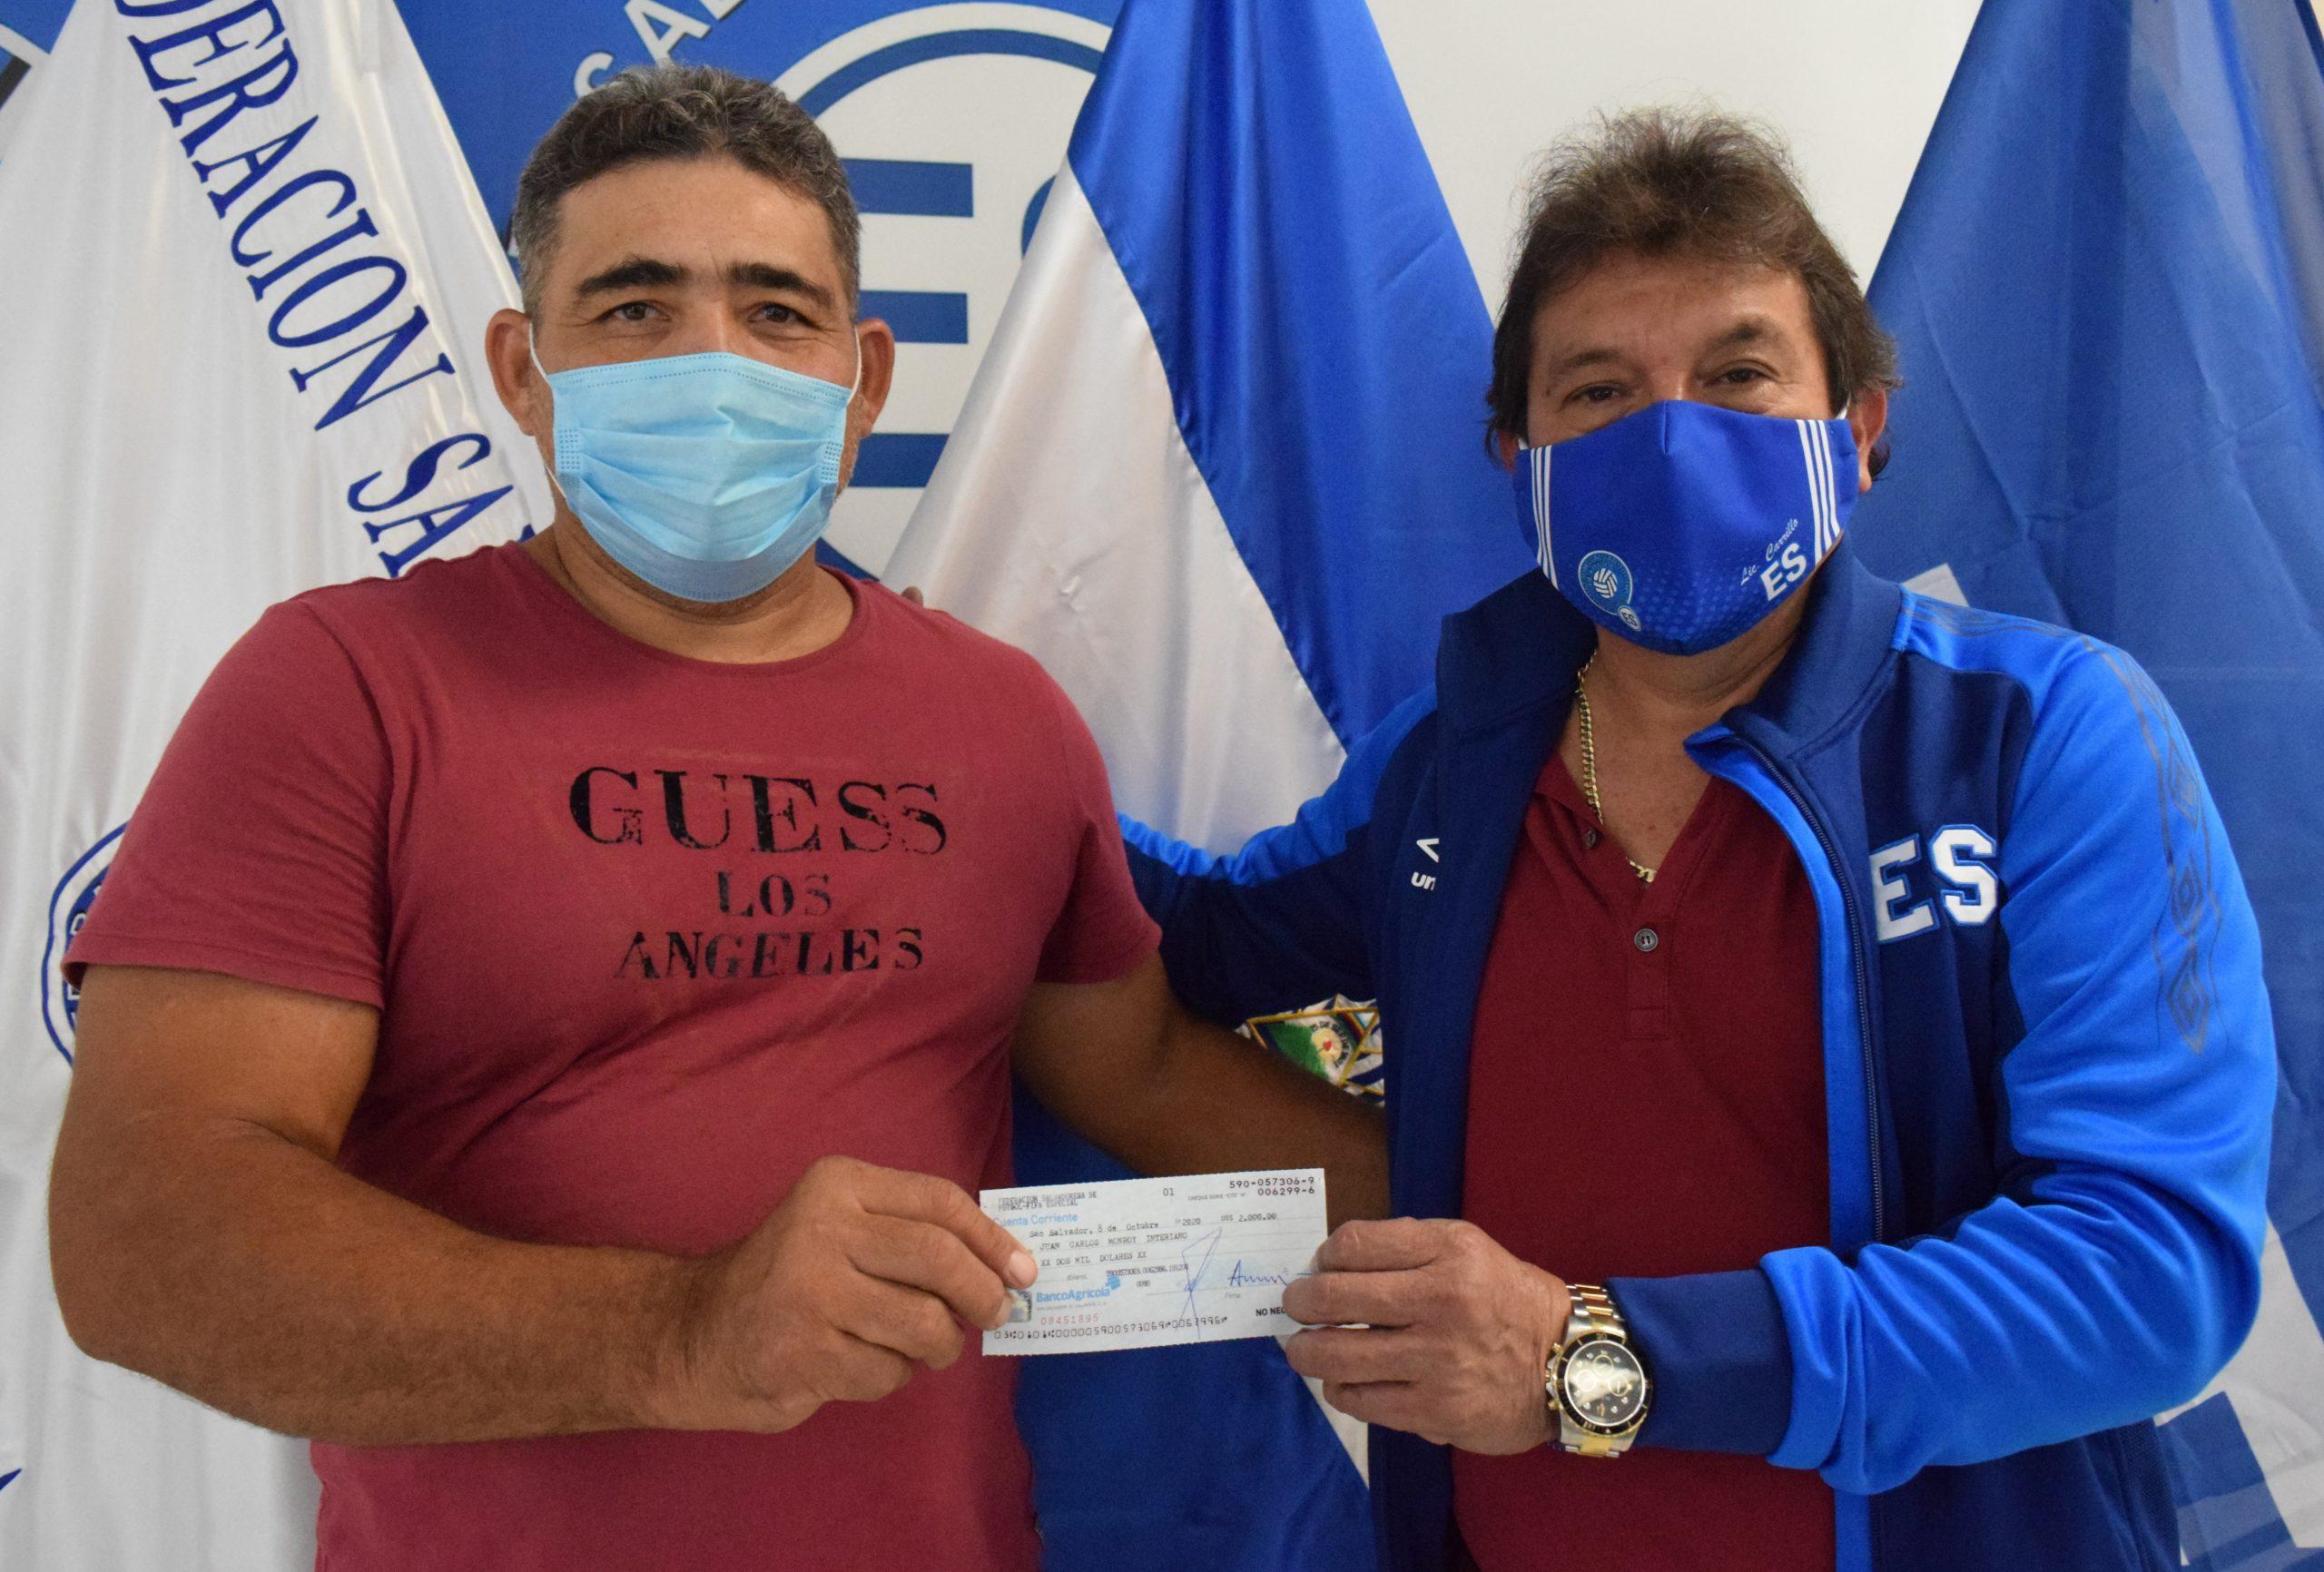 Presidente Juan Carlos Monroy de Club Deportivo Real Pajonal de San Antonio Pajonal, Santa Ana